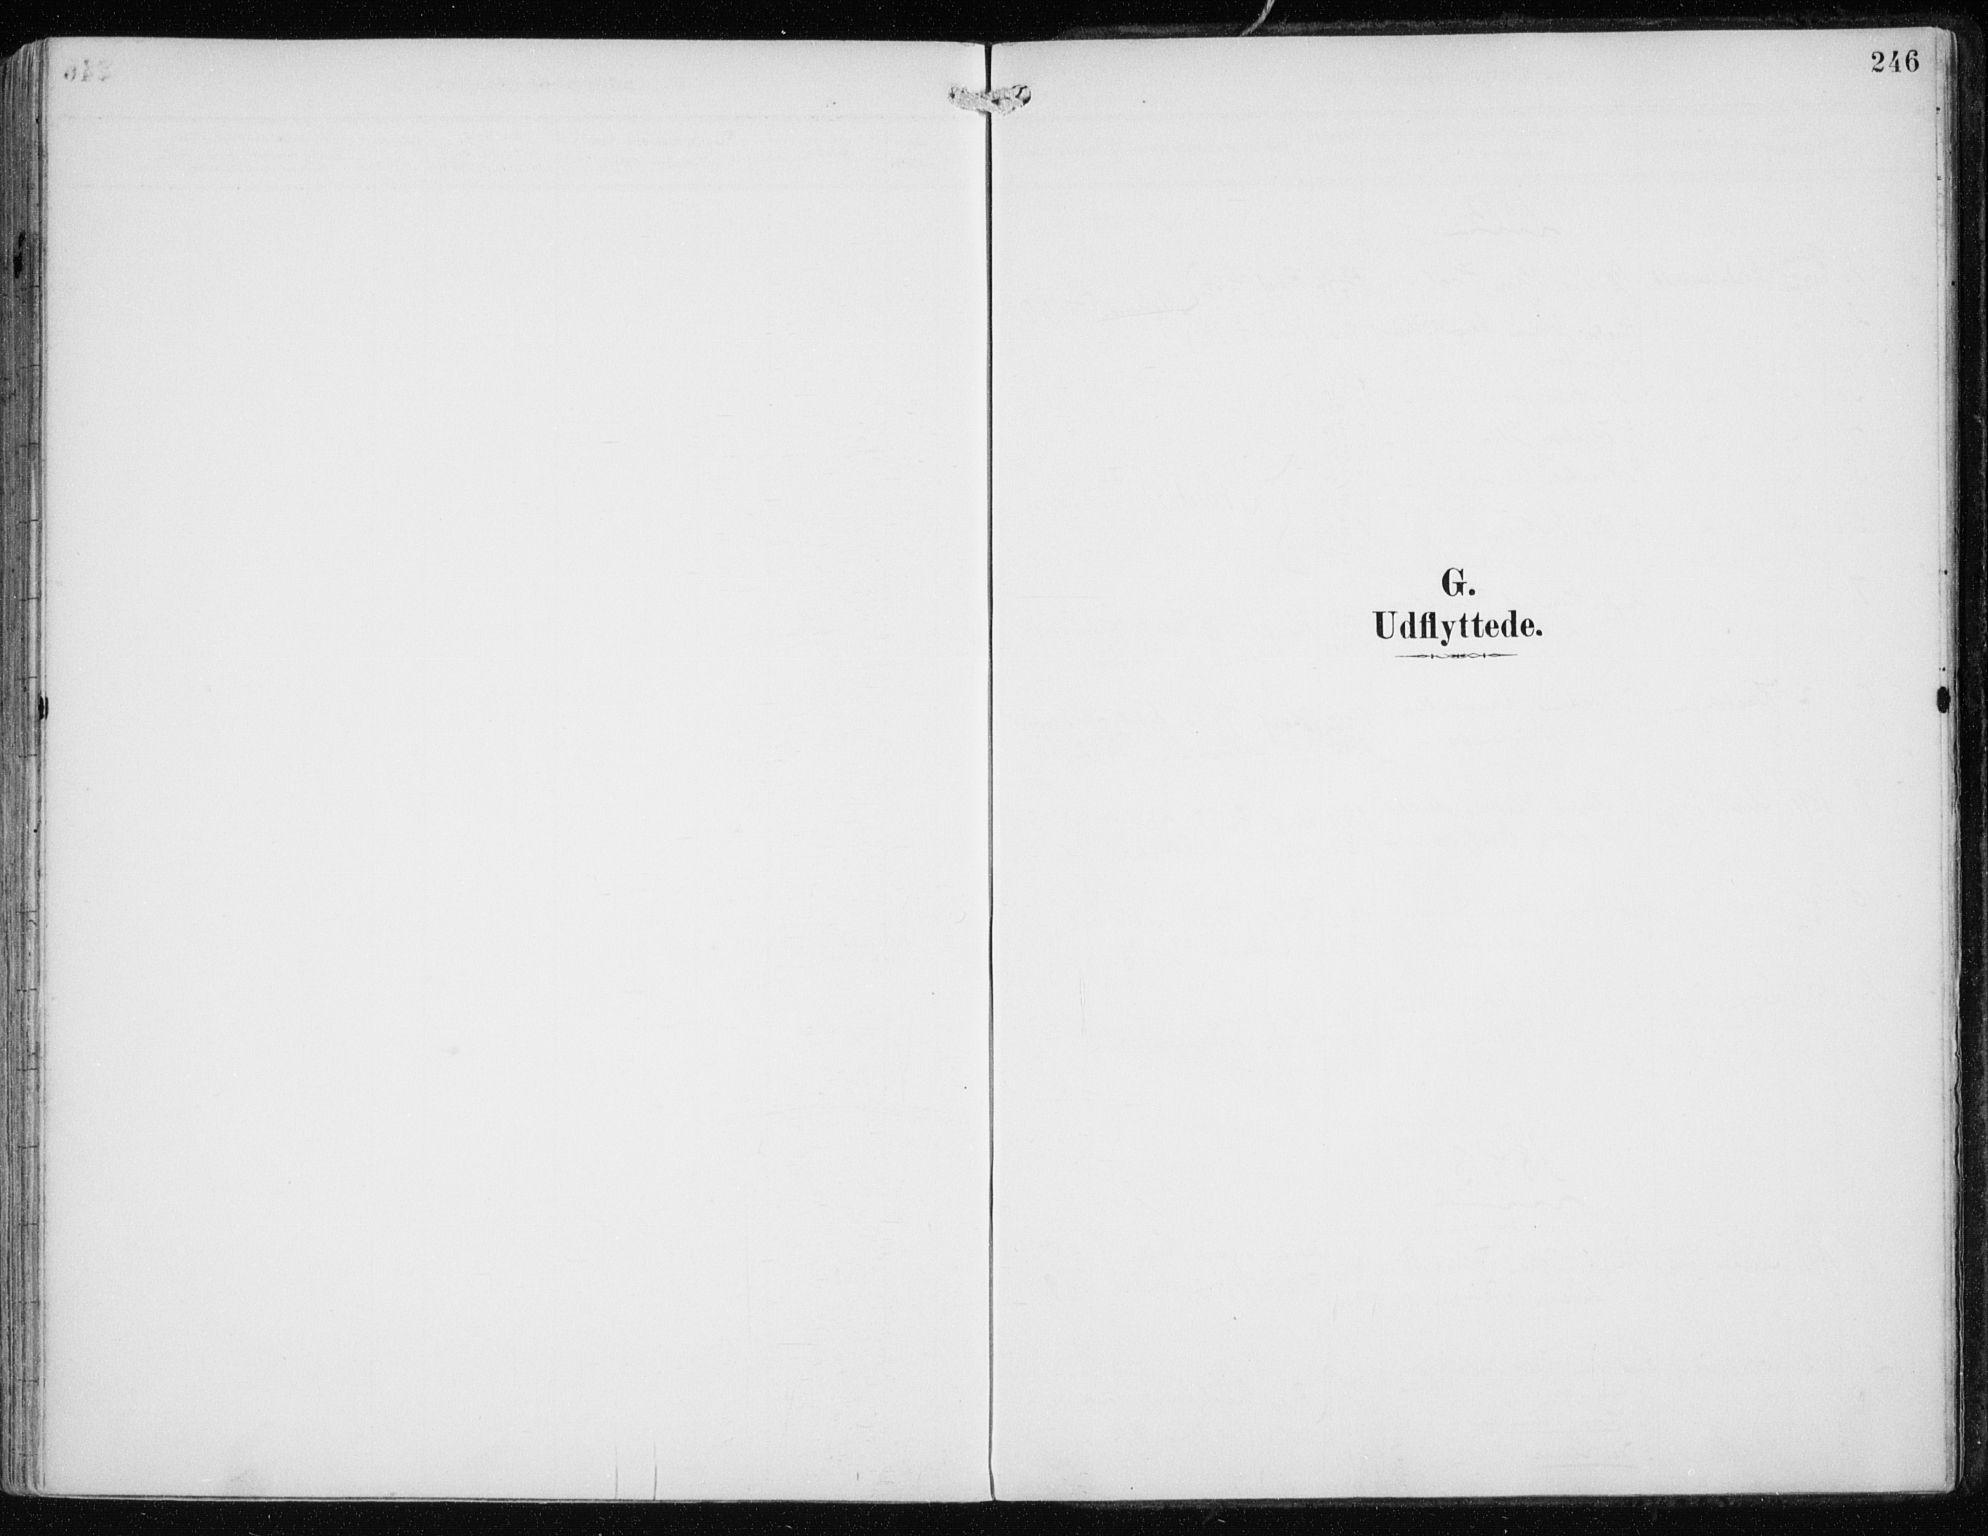 SATØ, Skjervøy sokneprestkontor, H/Ha/Haa/L0016kirke: Ministerialbok nr. 16, 1892-1908, s. 246